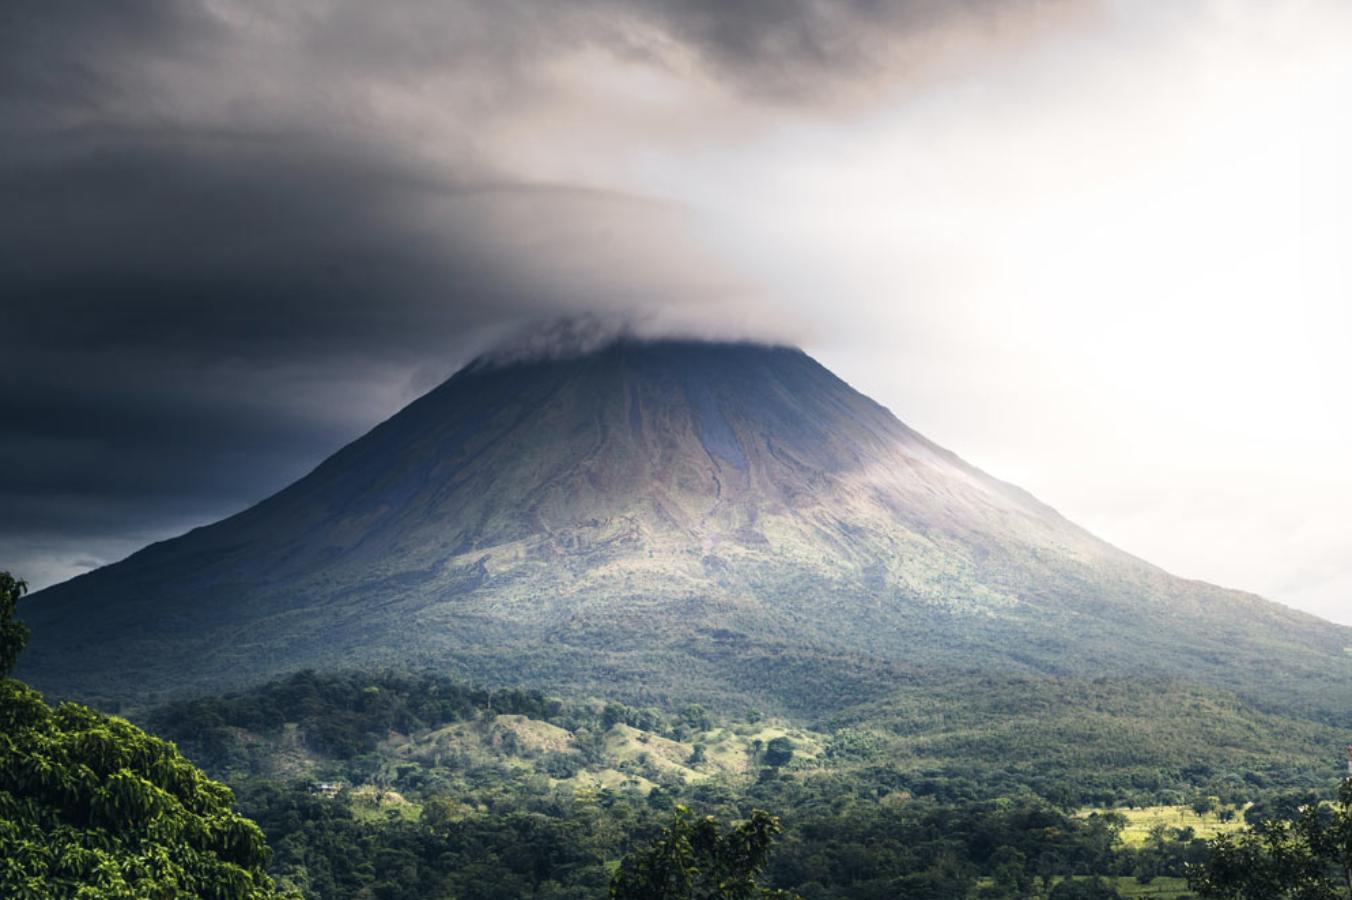 vulcão Costa Rica